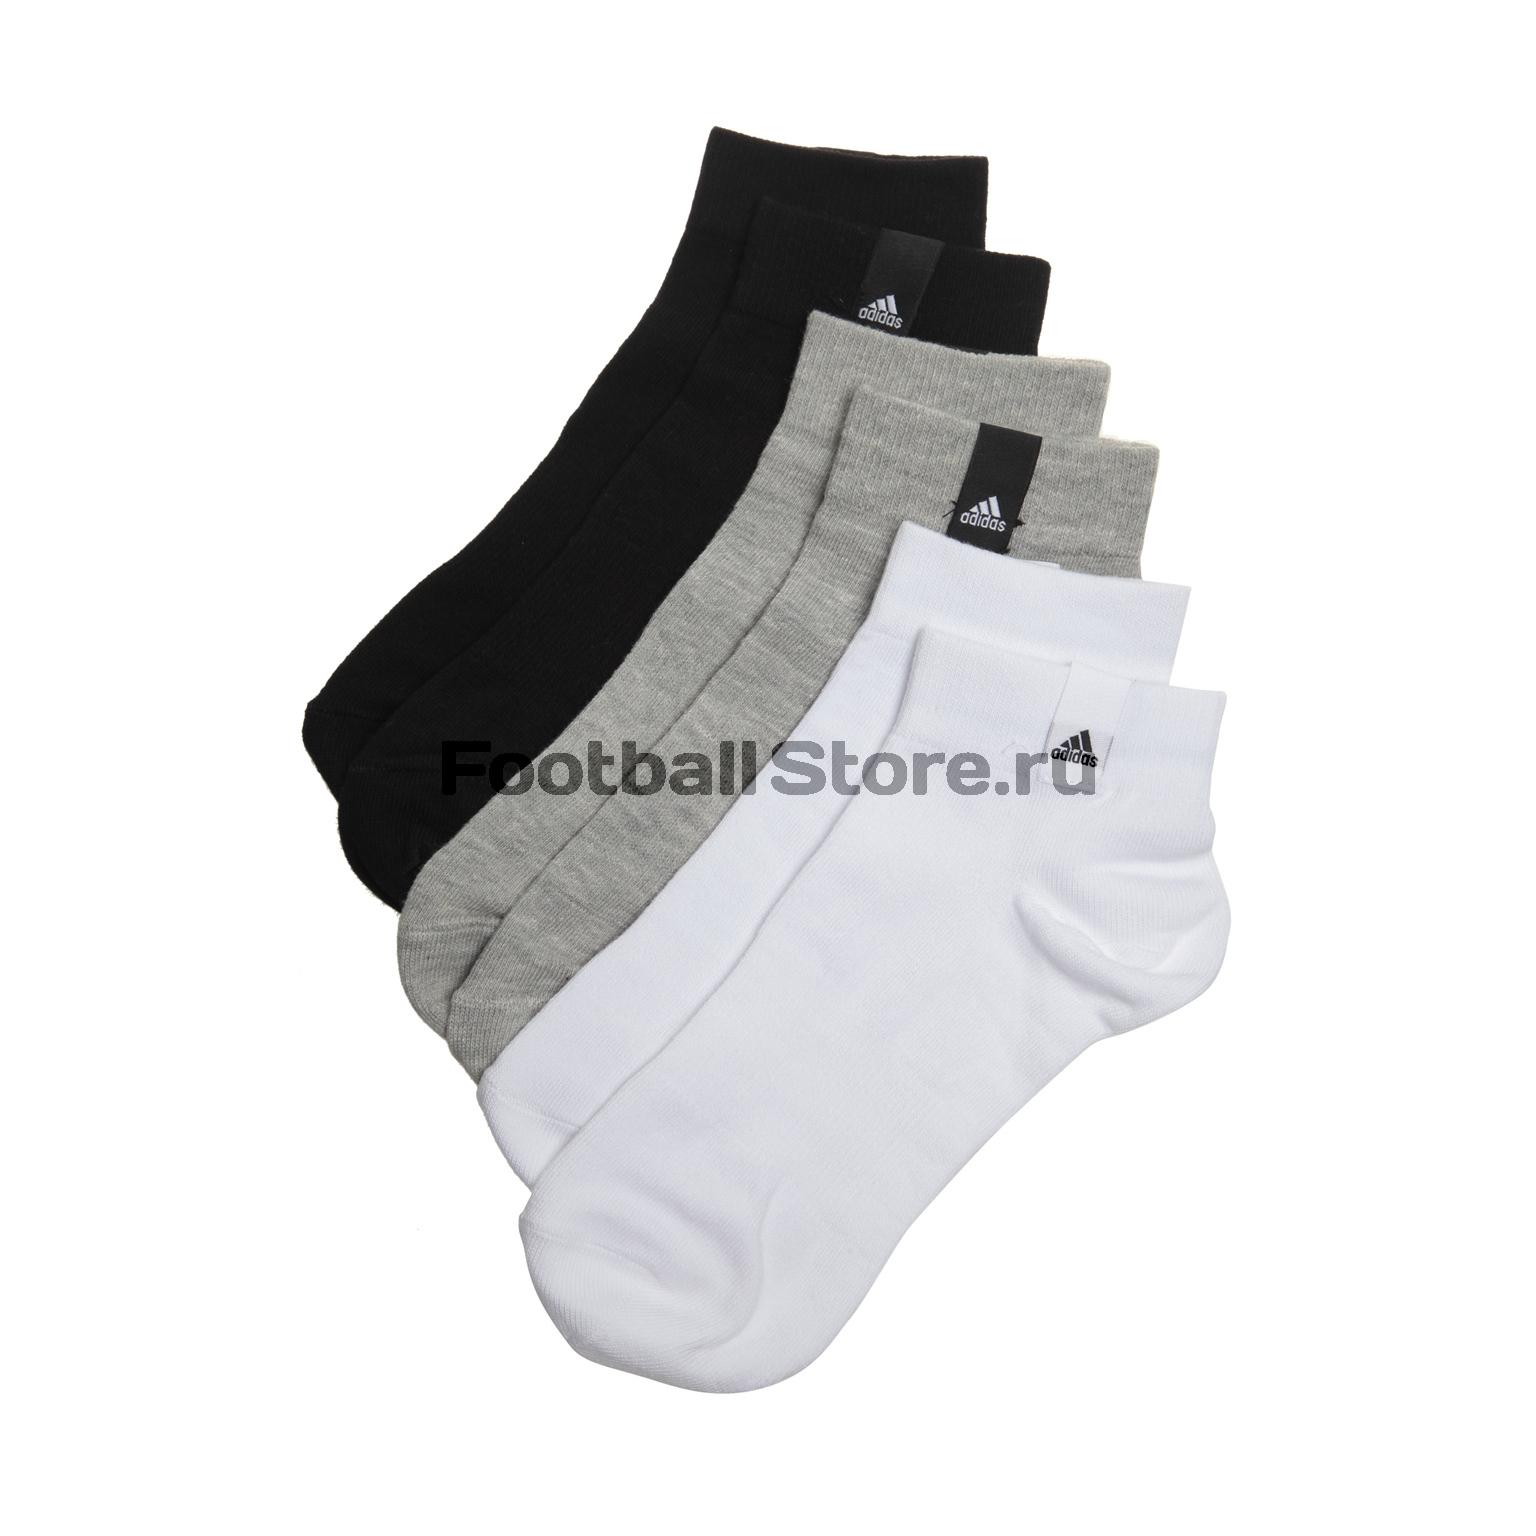 Комплект носков Adidas Label Thin Ankle 3-Pack AA2485 носки adidas носки per la ankle 3p